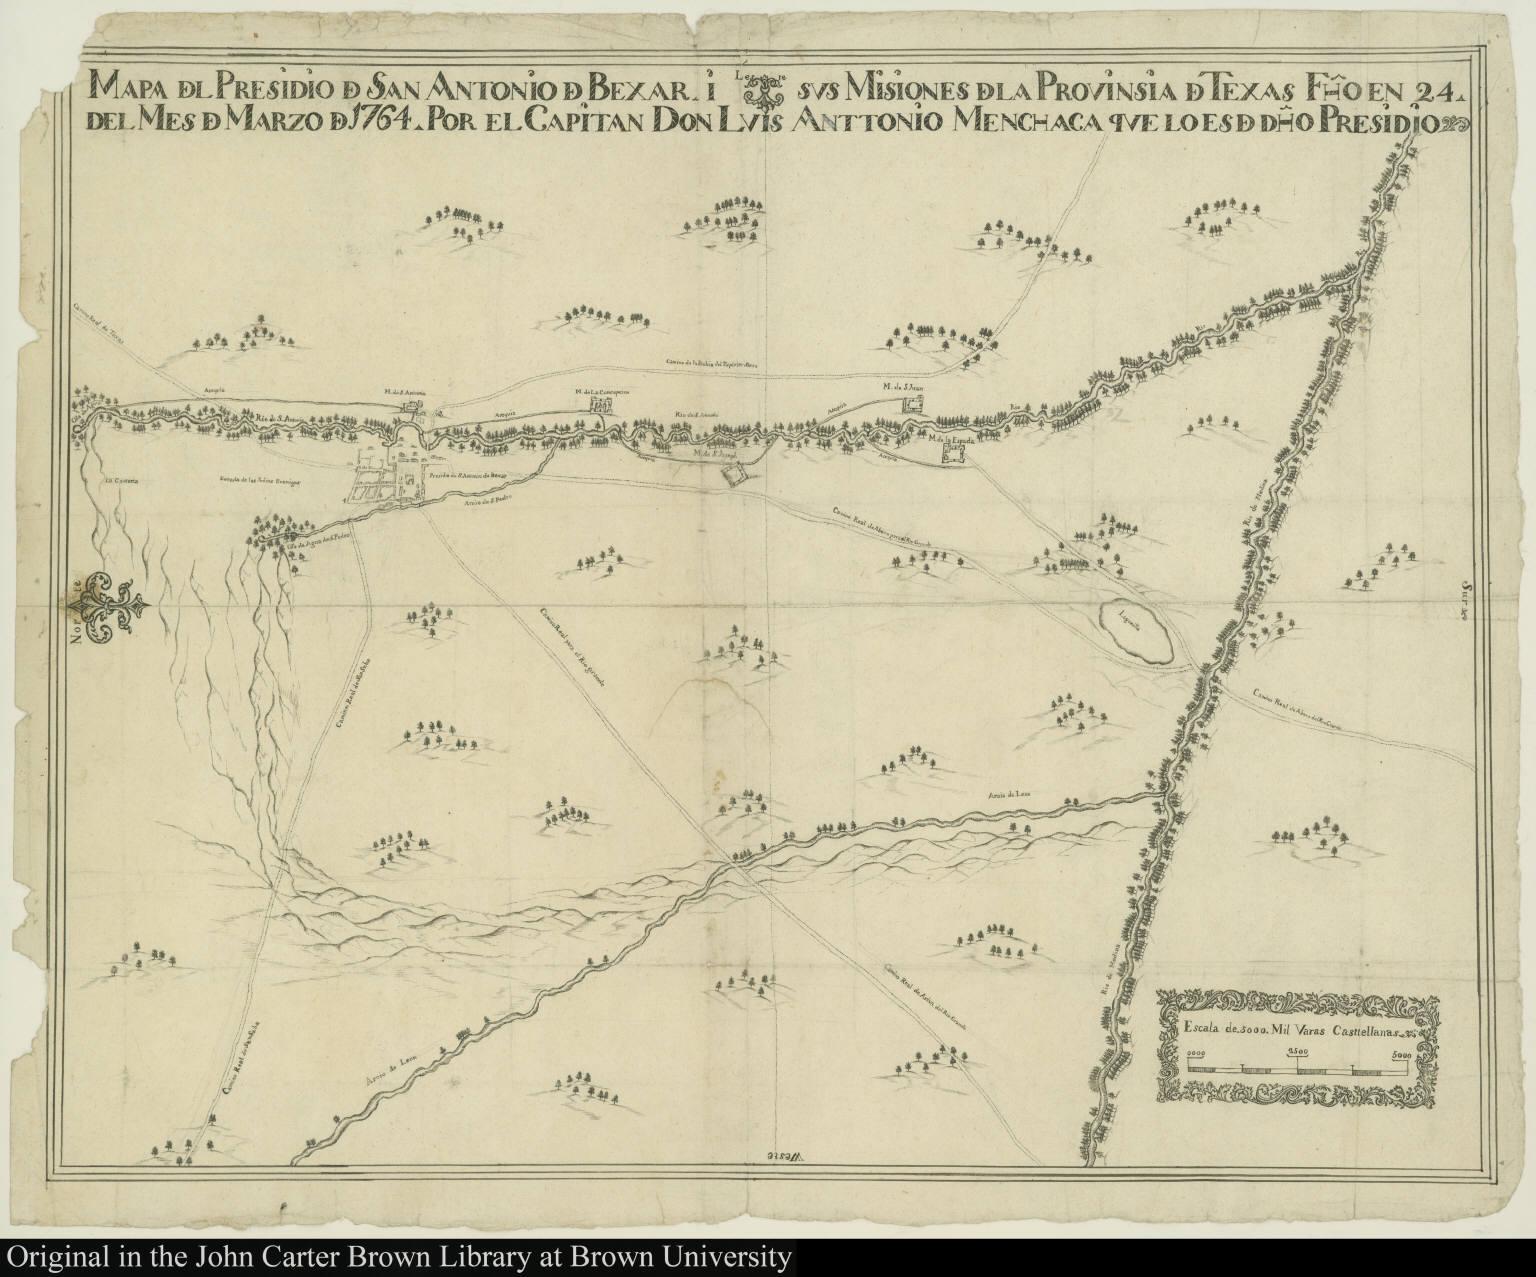 Mapa d[e]l Presidio d[e] San Antonio d[e] Bexar, i sus Misiones d[e]la Provinsia d[e] Texas ...